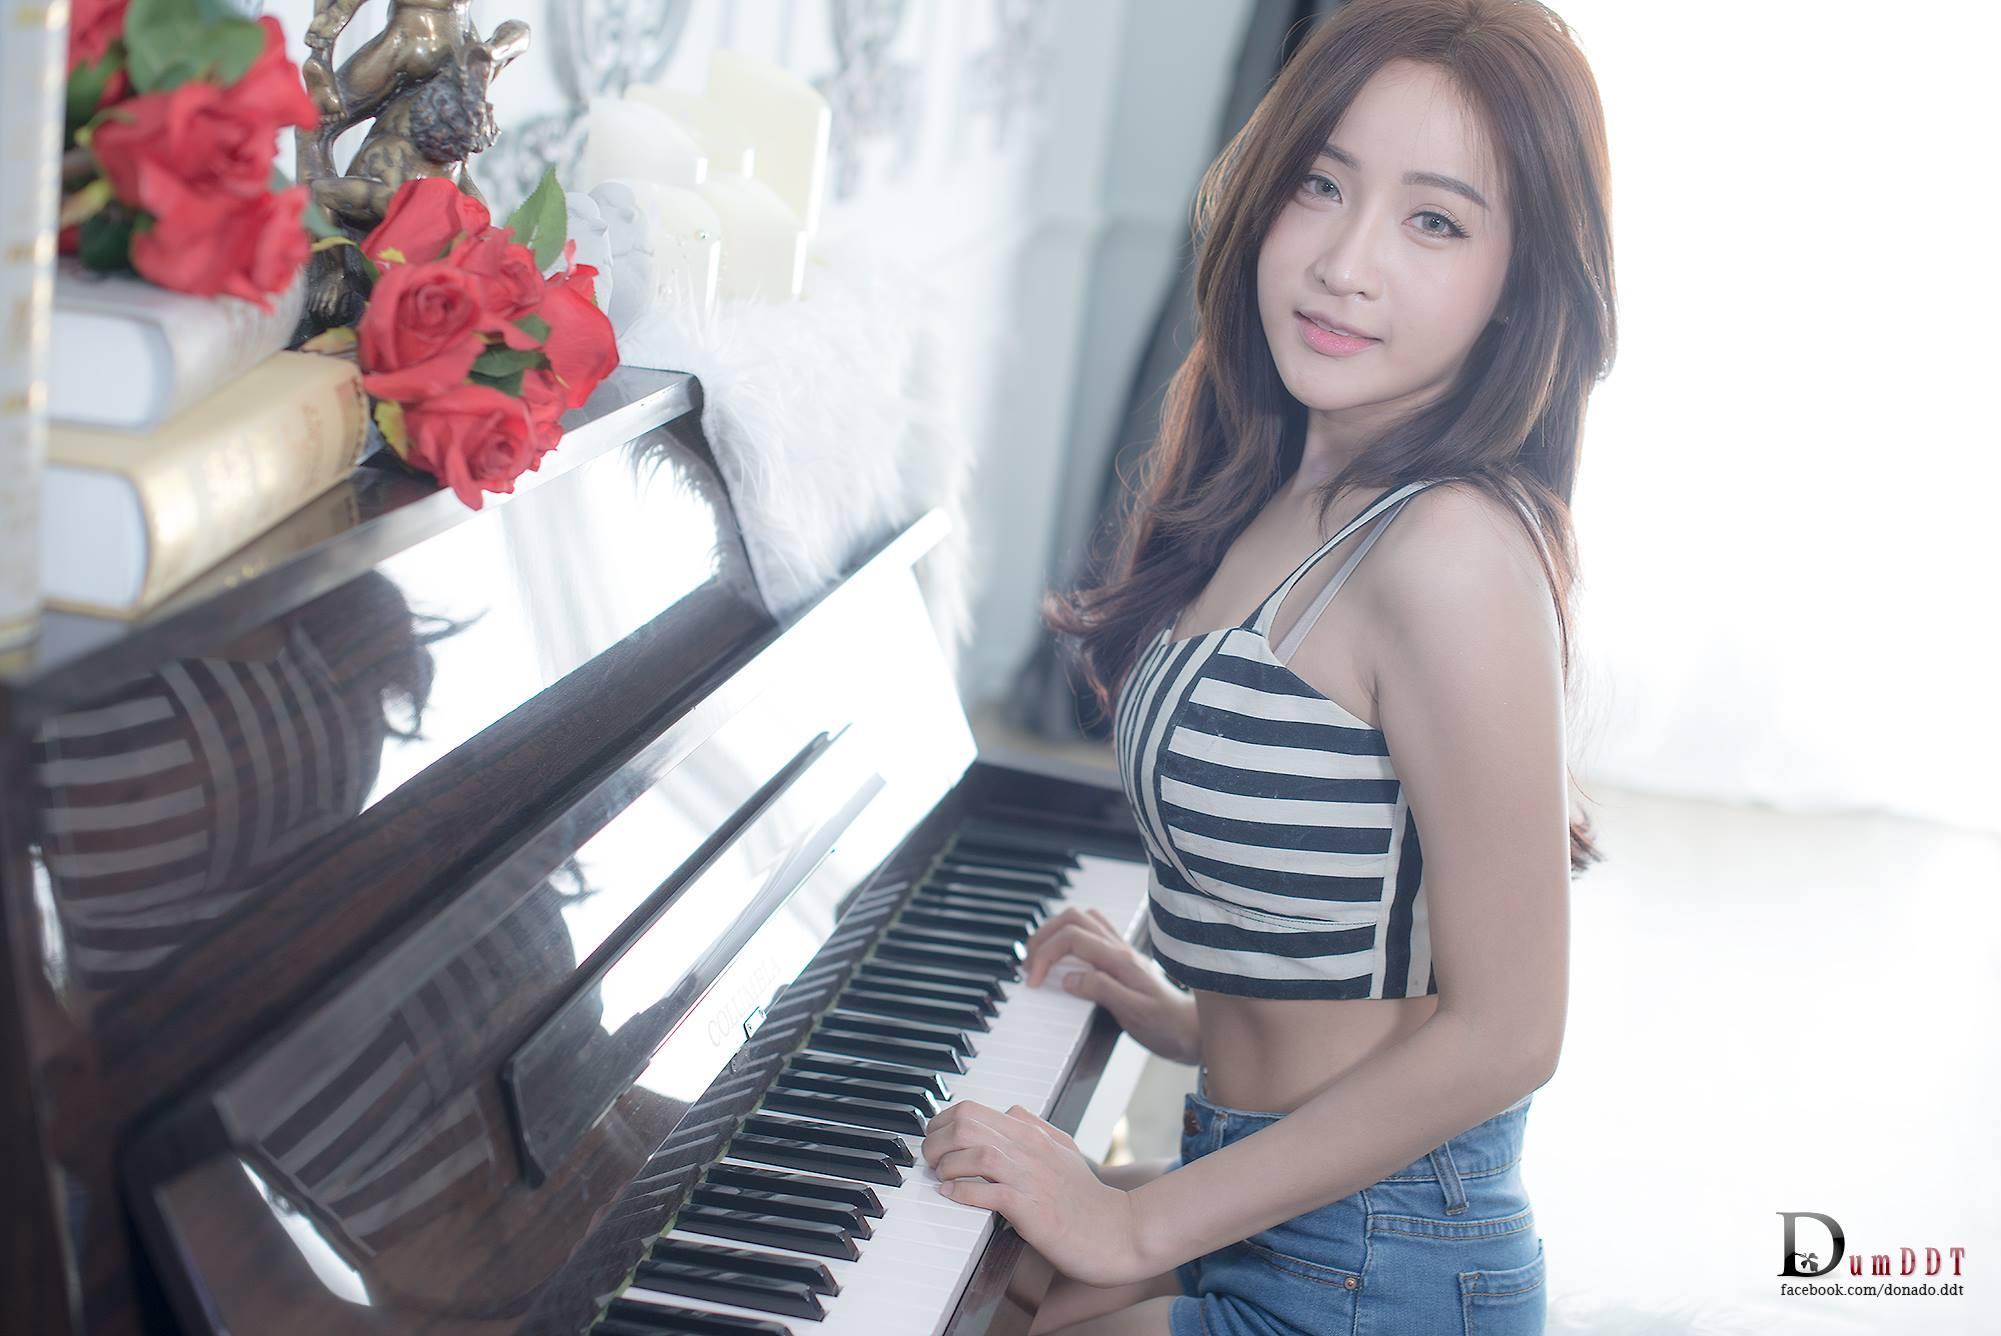 Piano Lessons - Thanyarat Charoenpornkittada